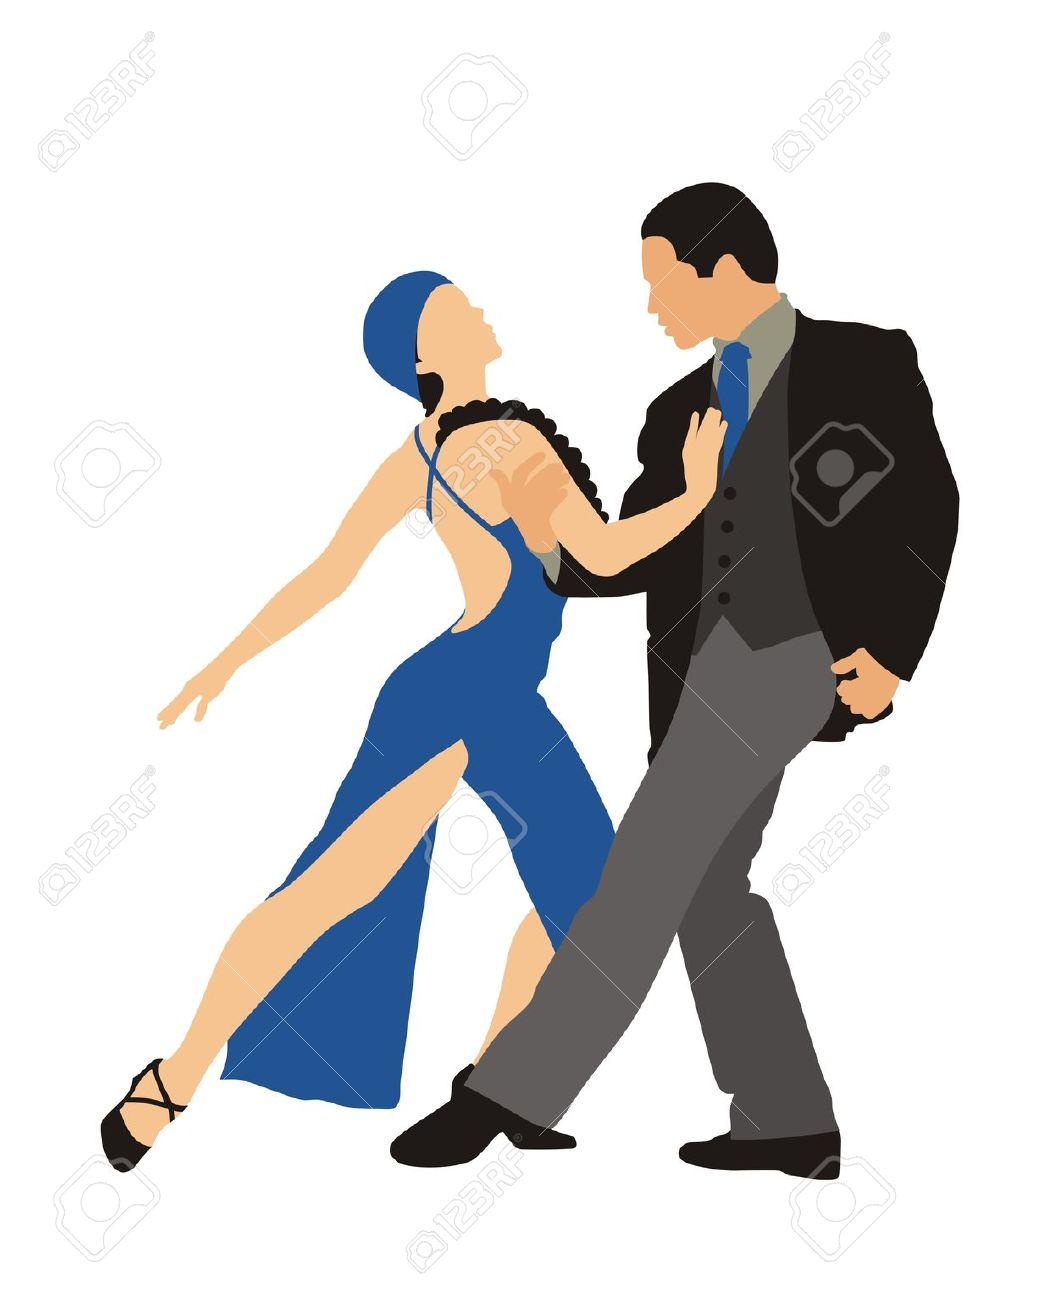 1037x1300 Dancer Clipart, Suggestions For Dancer Clipart, Download Dancer